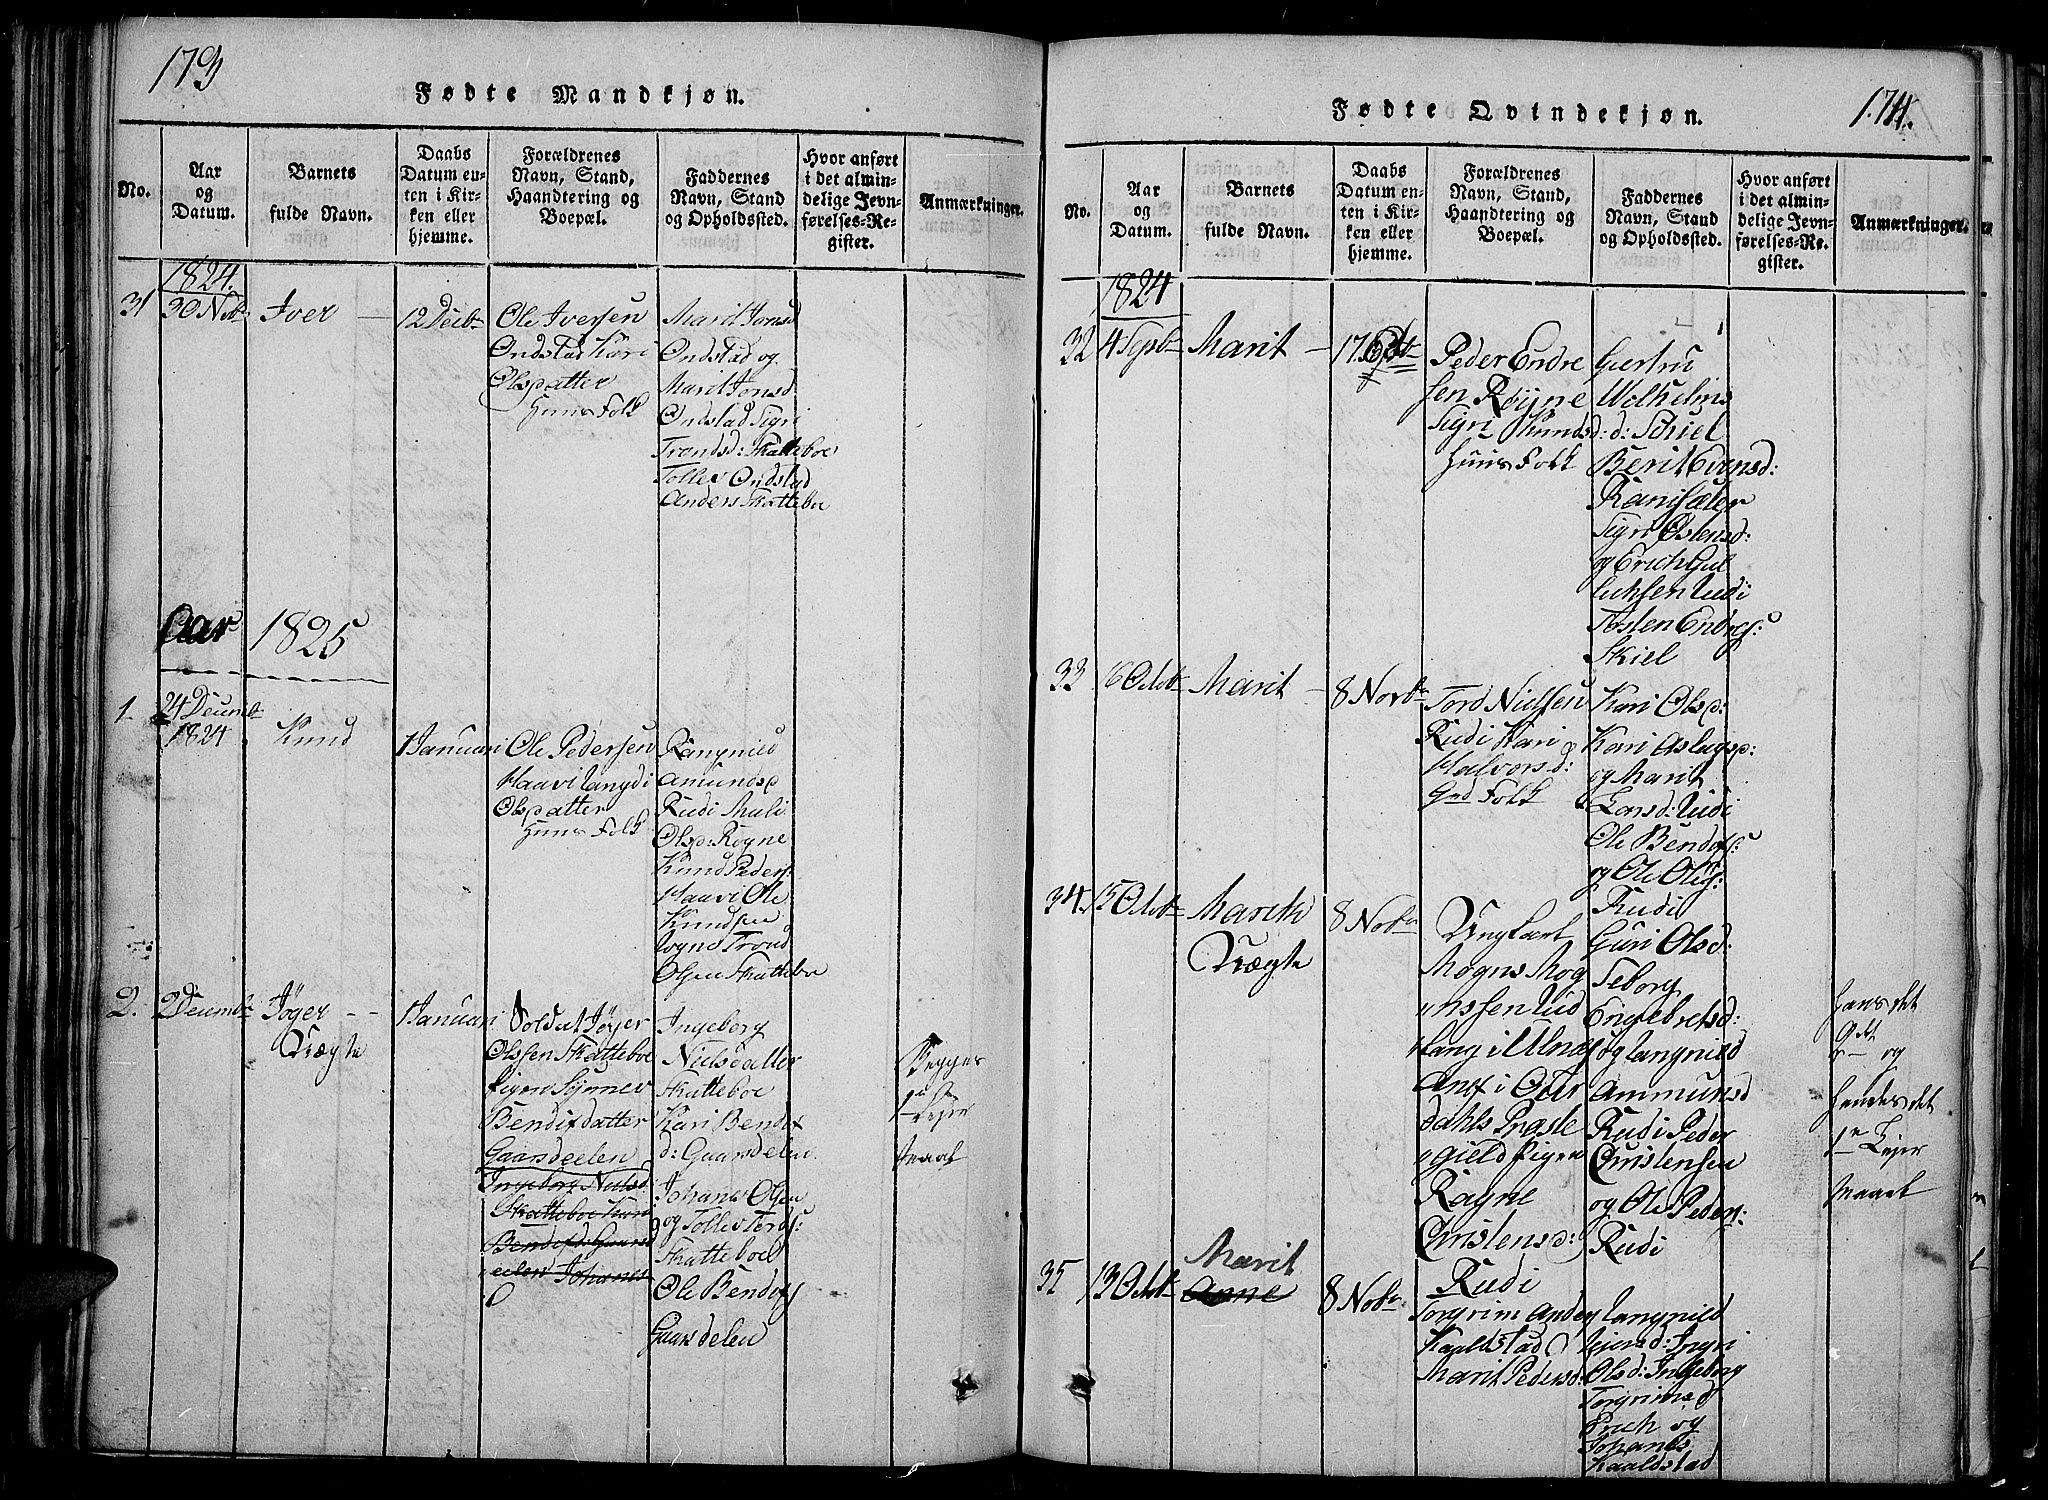 SAH, Slidre prestekontor, Klokkerbok nr. 2, 1814-1839, s. 173-174